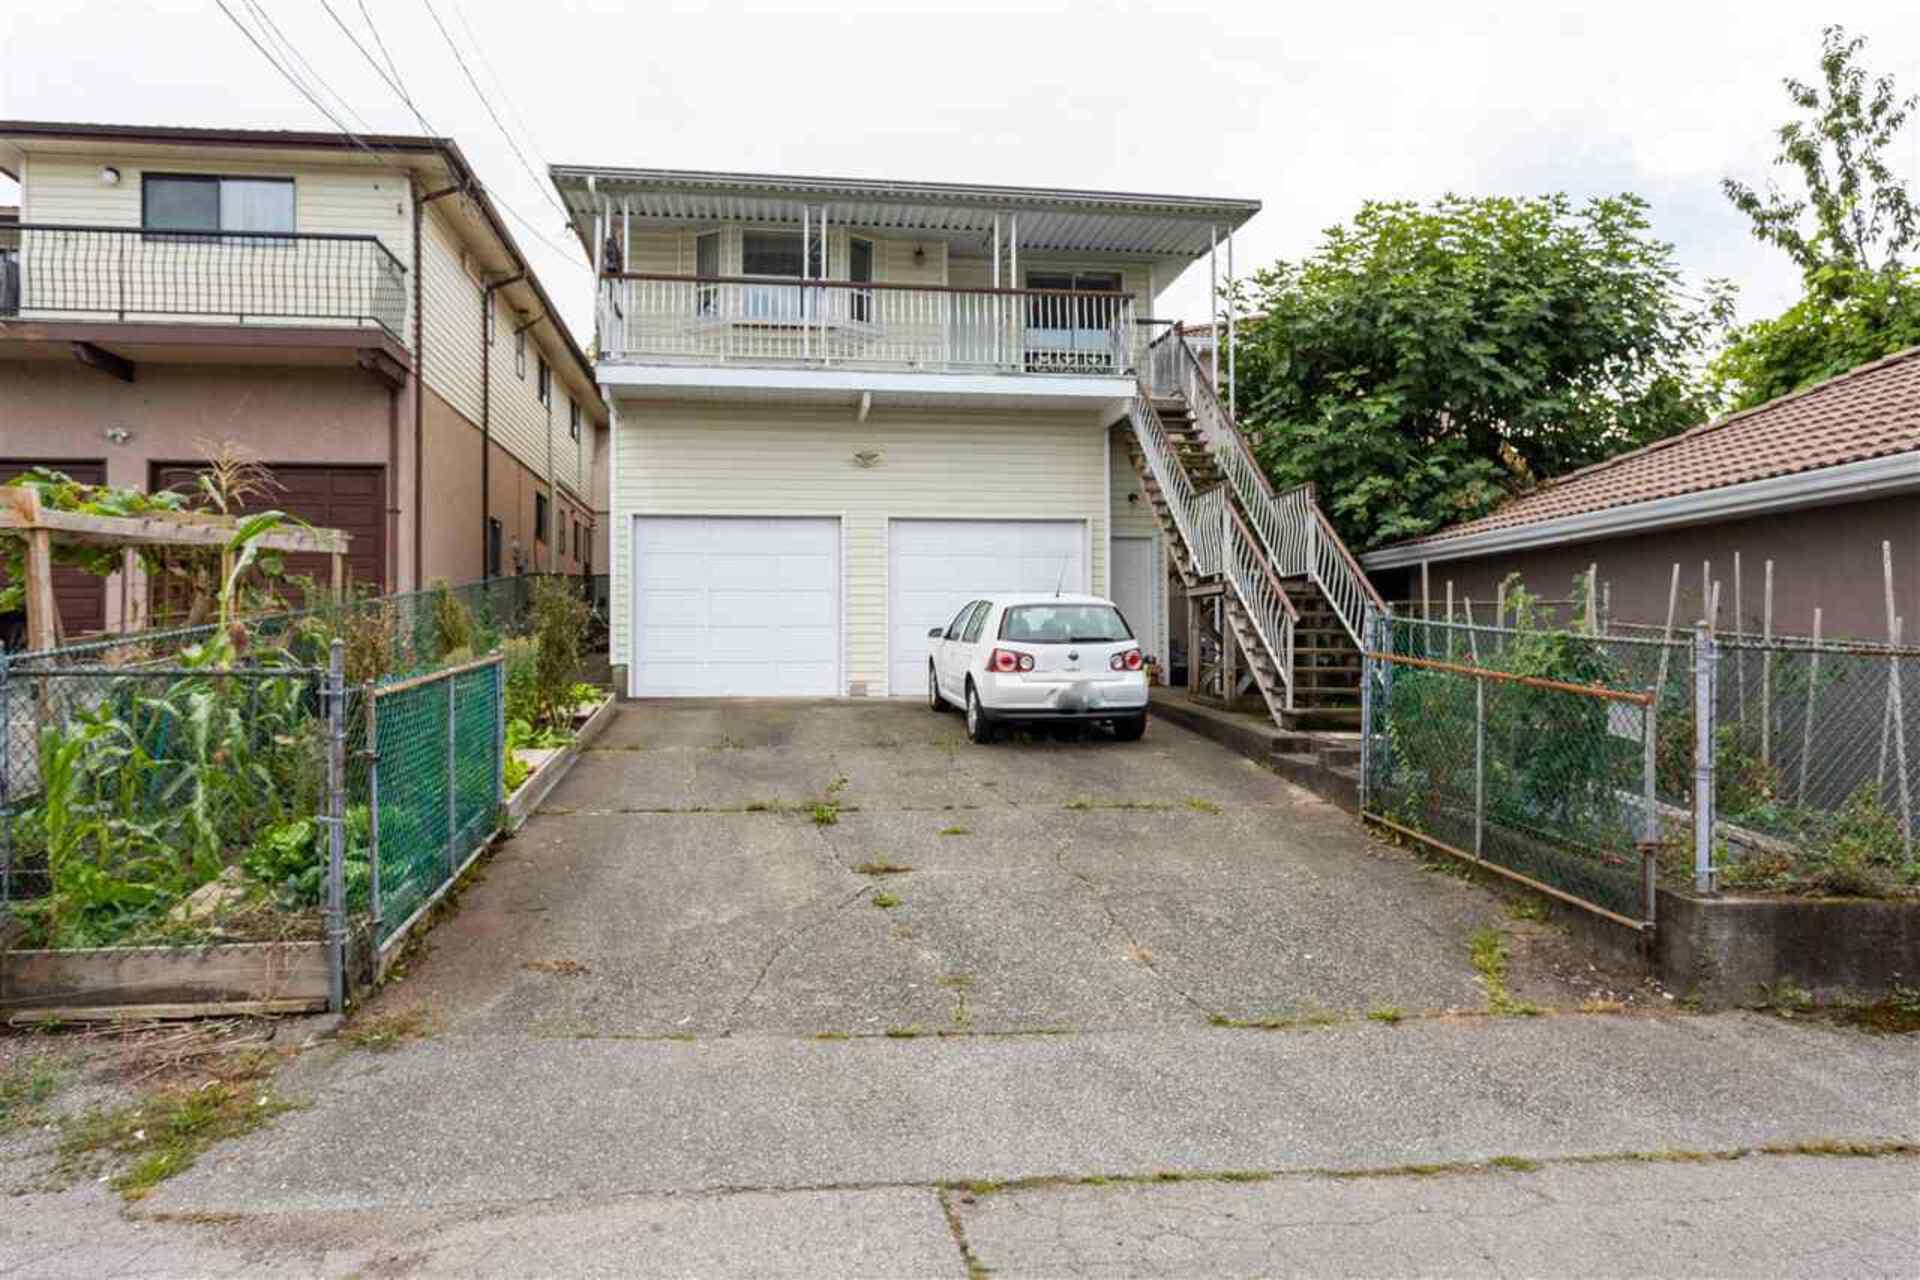 2675-e-5th-avenue-renfrew-ve-vancouver-east-35 at 2675 E 5th Avenue, Renfrew VE, Vancouver East